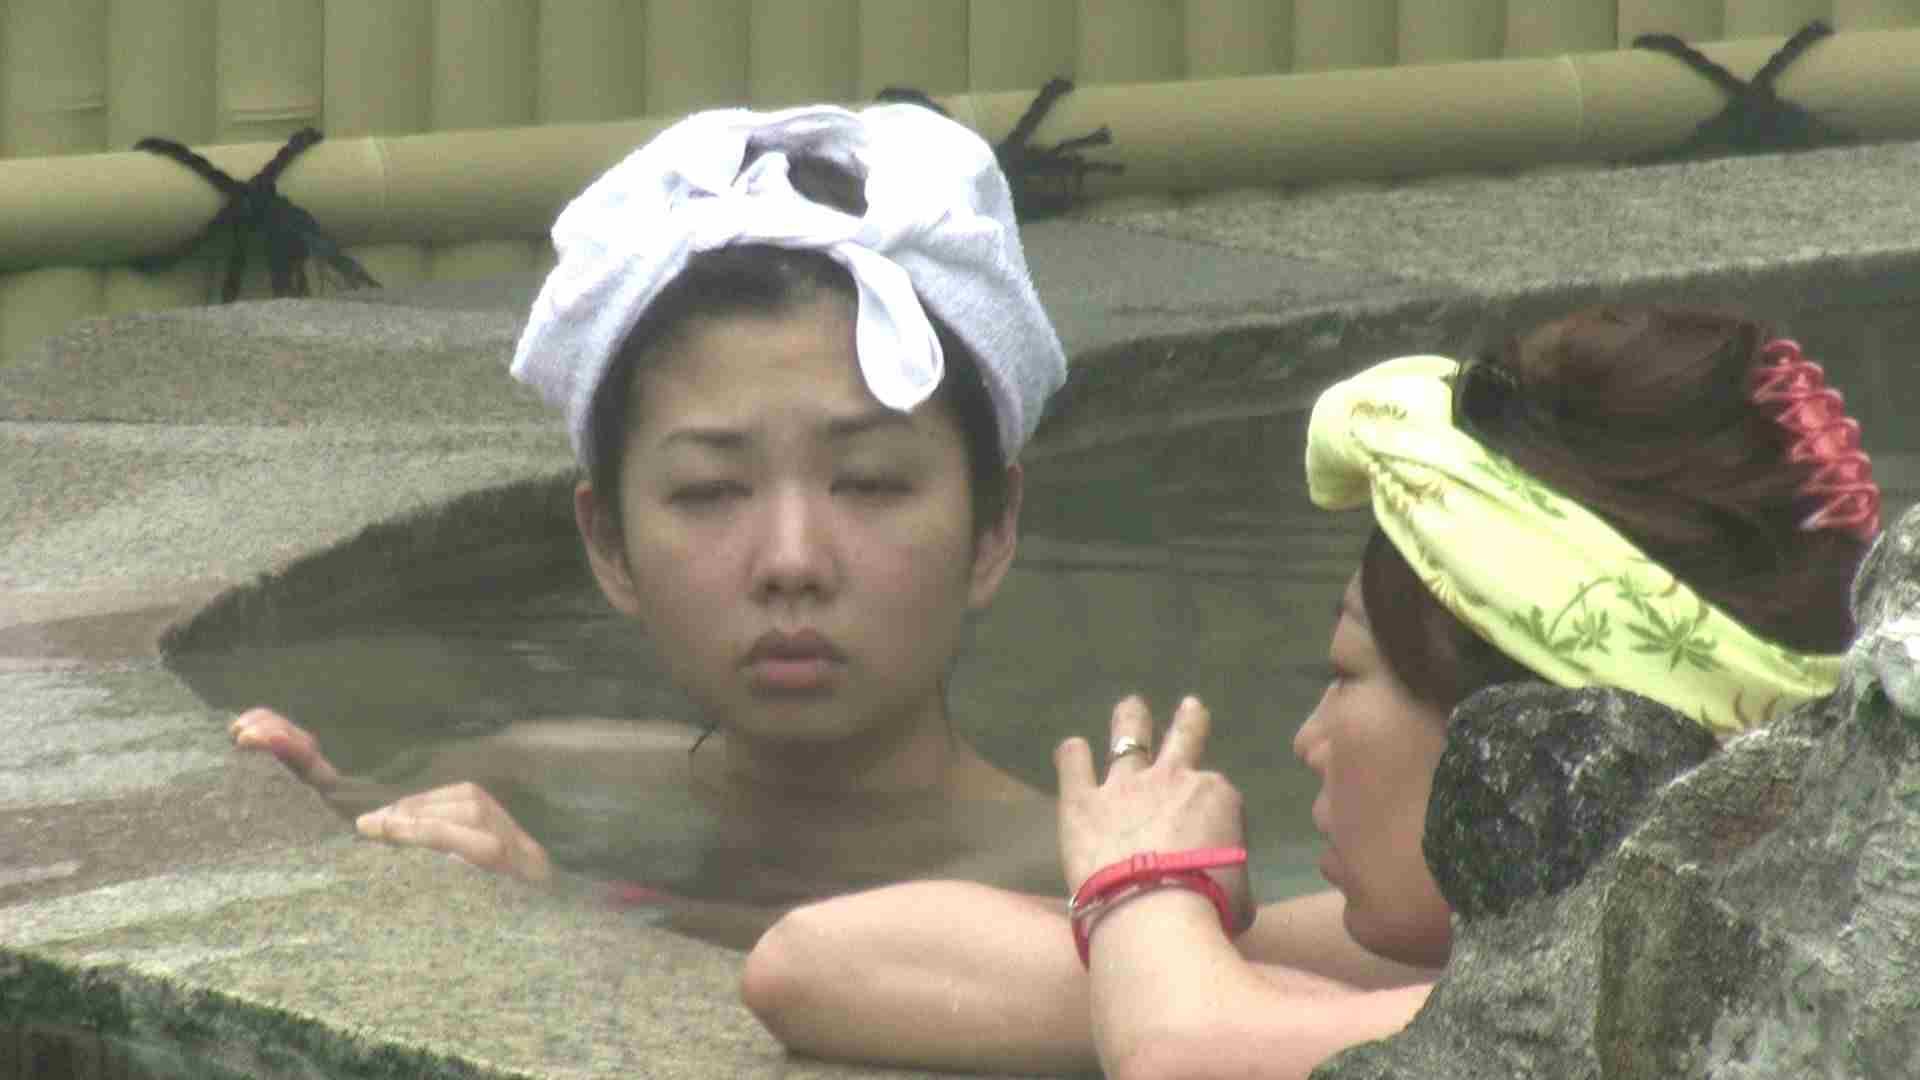 Aquaな露天風呂Vol.192 露天風呂 | OLのエロ生活  79連発 19